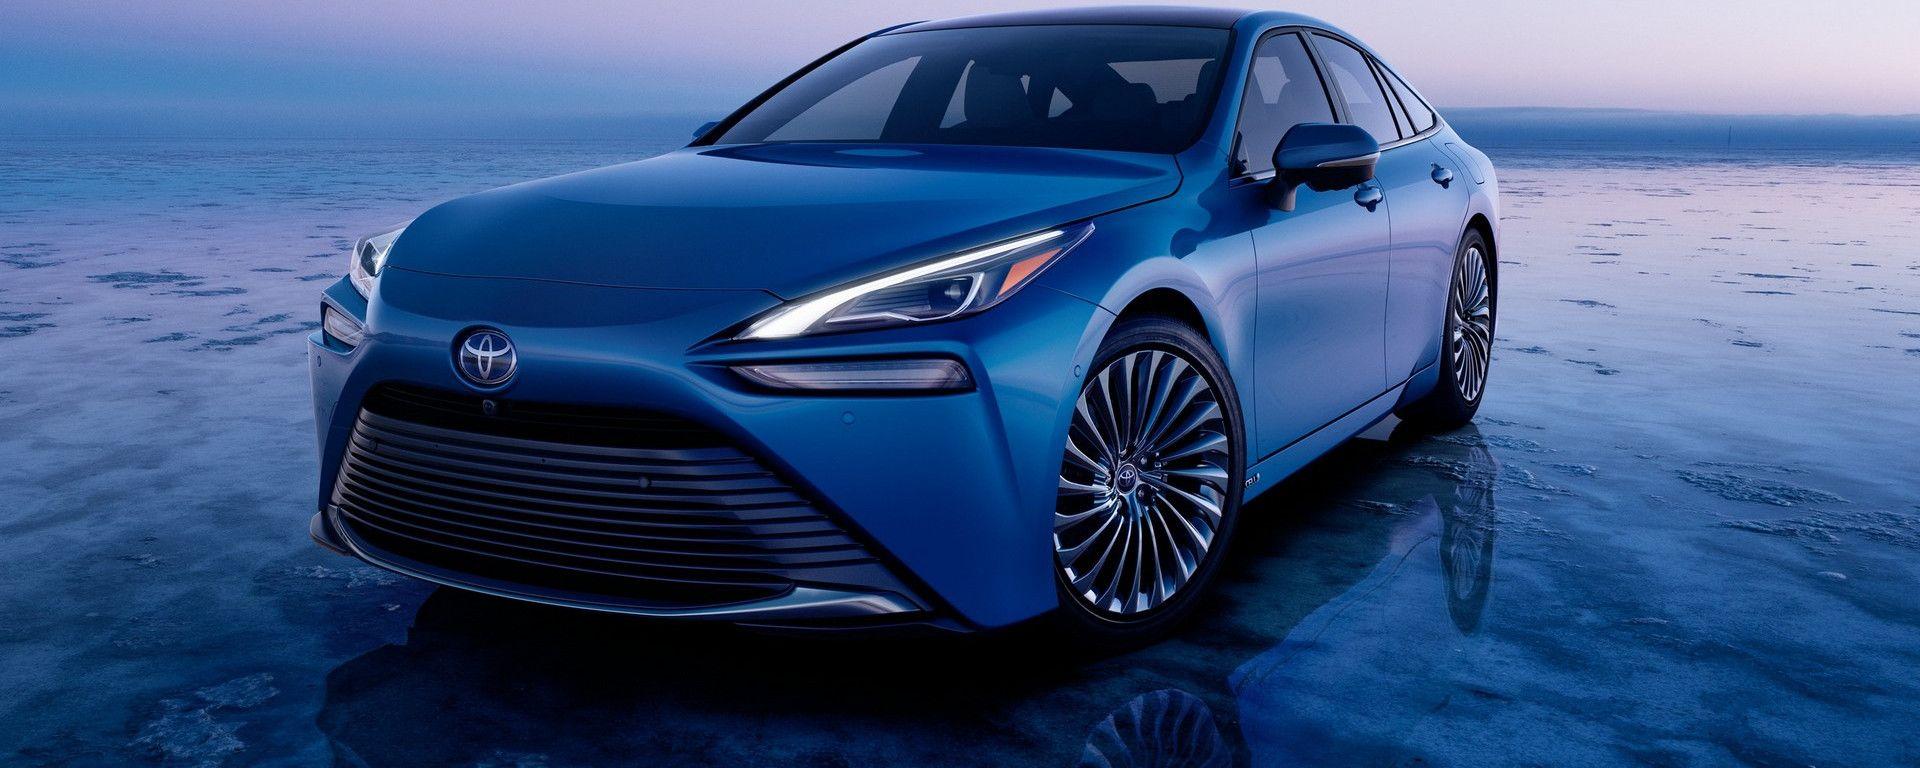 Toyota Mirai 2021: la potenza cresce a 182 CV